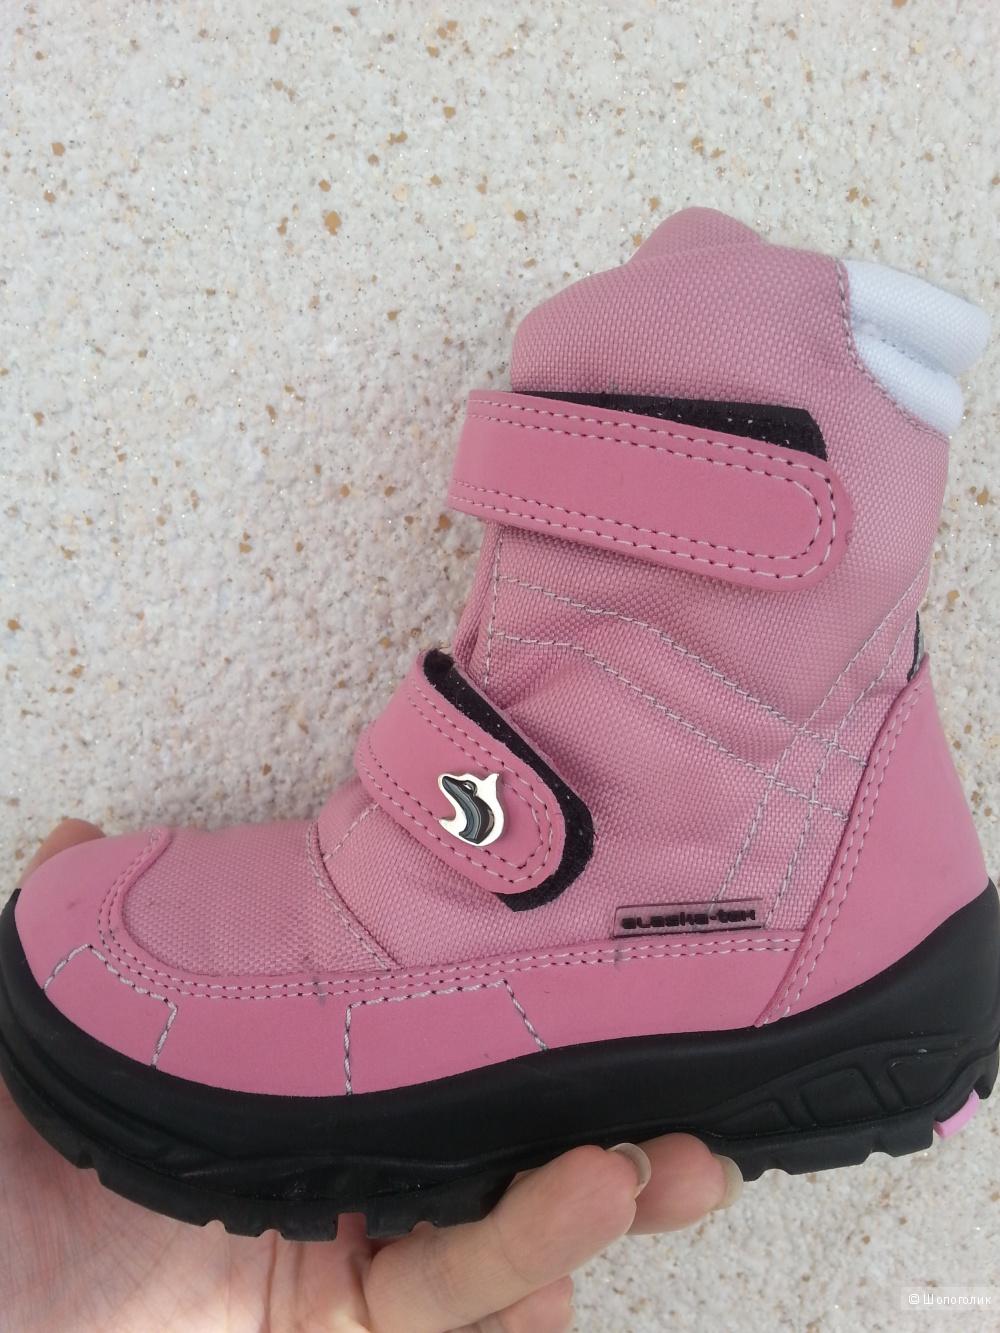 Зимние ботиночки Аляска оригинал 27 размера